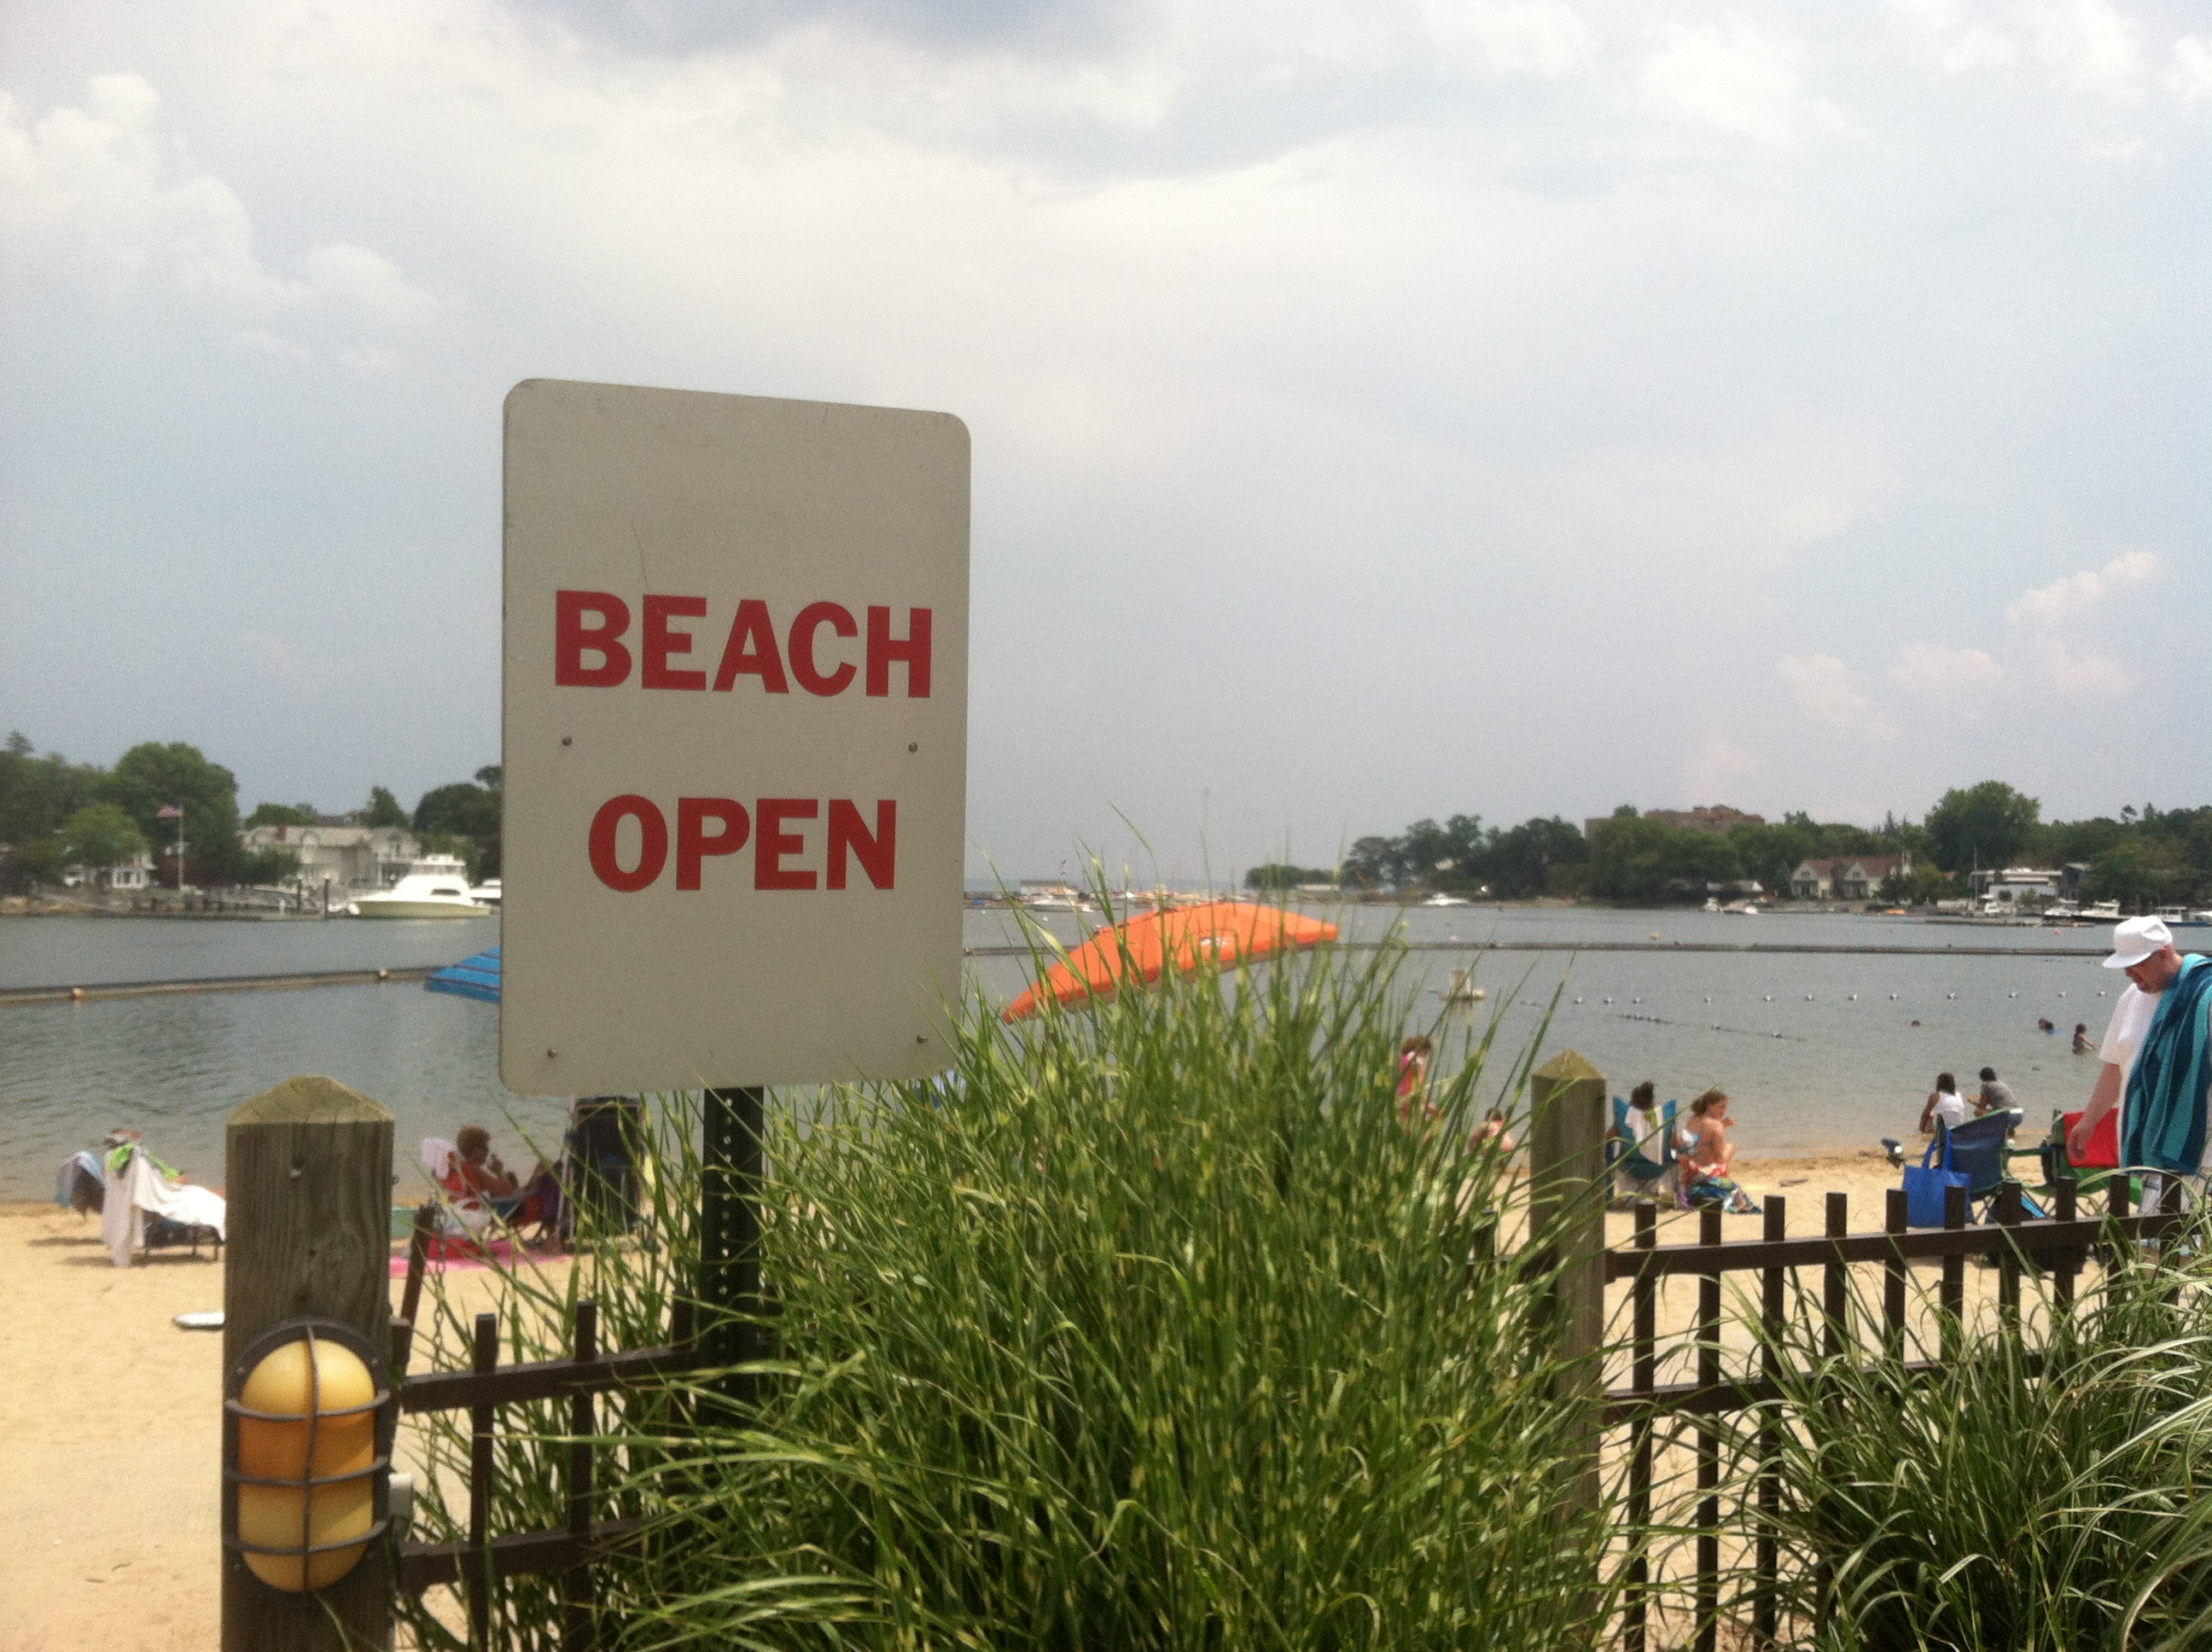 beachOpenSignMamaroneck